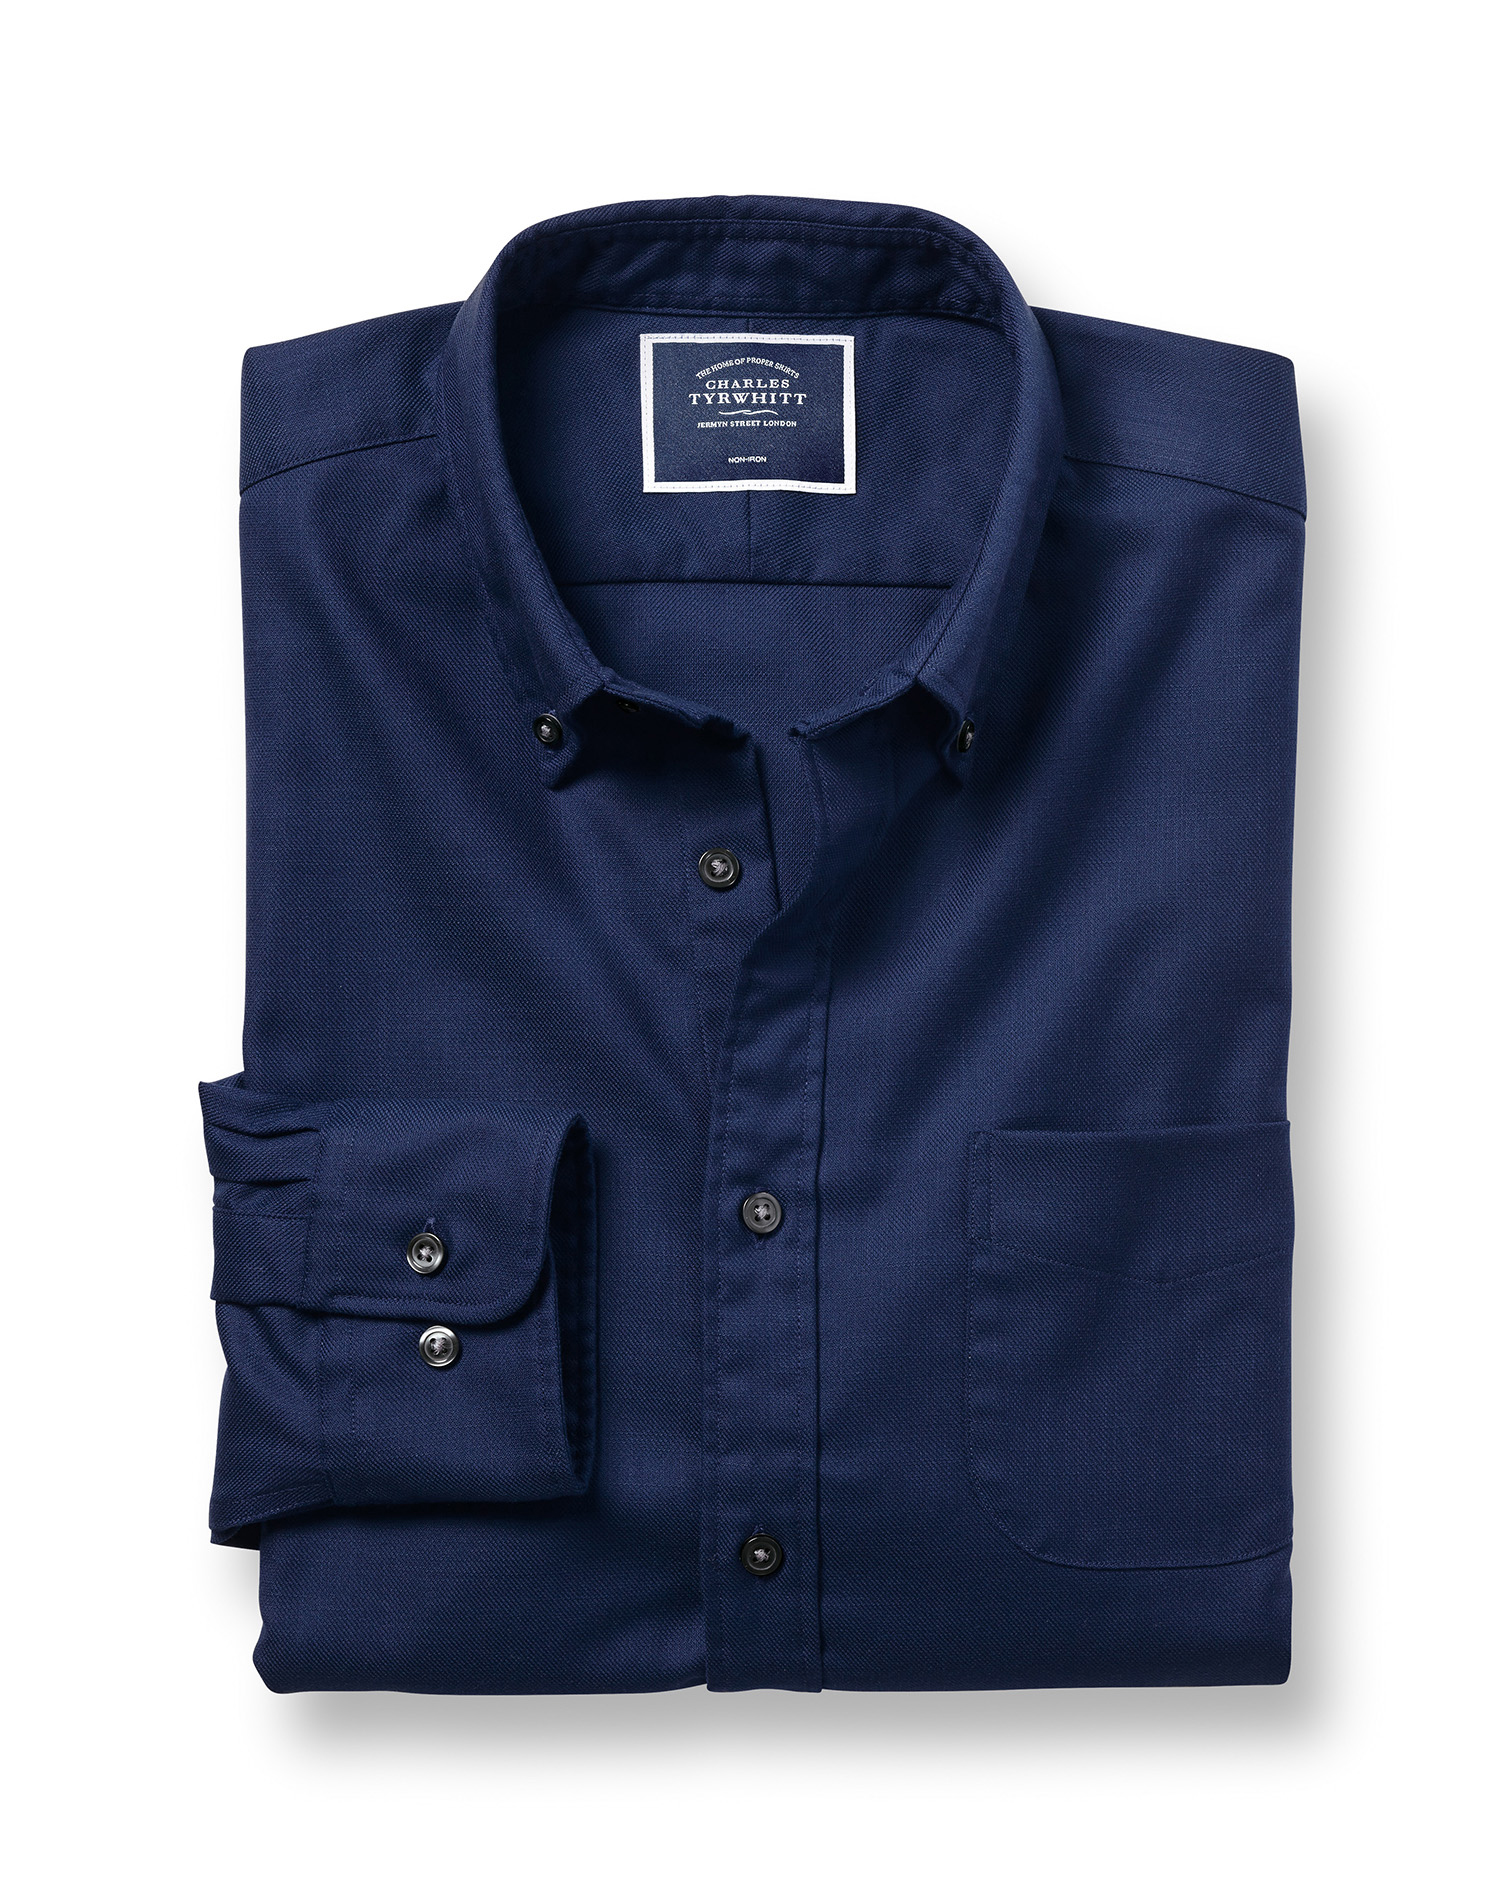 Cotton Extra Slim Fit Soft Washed Non-Iron Twill Dark Blue Shirt